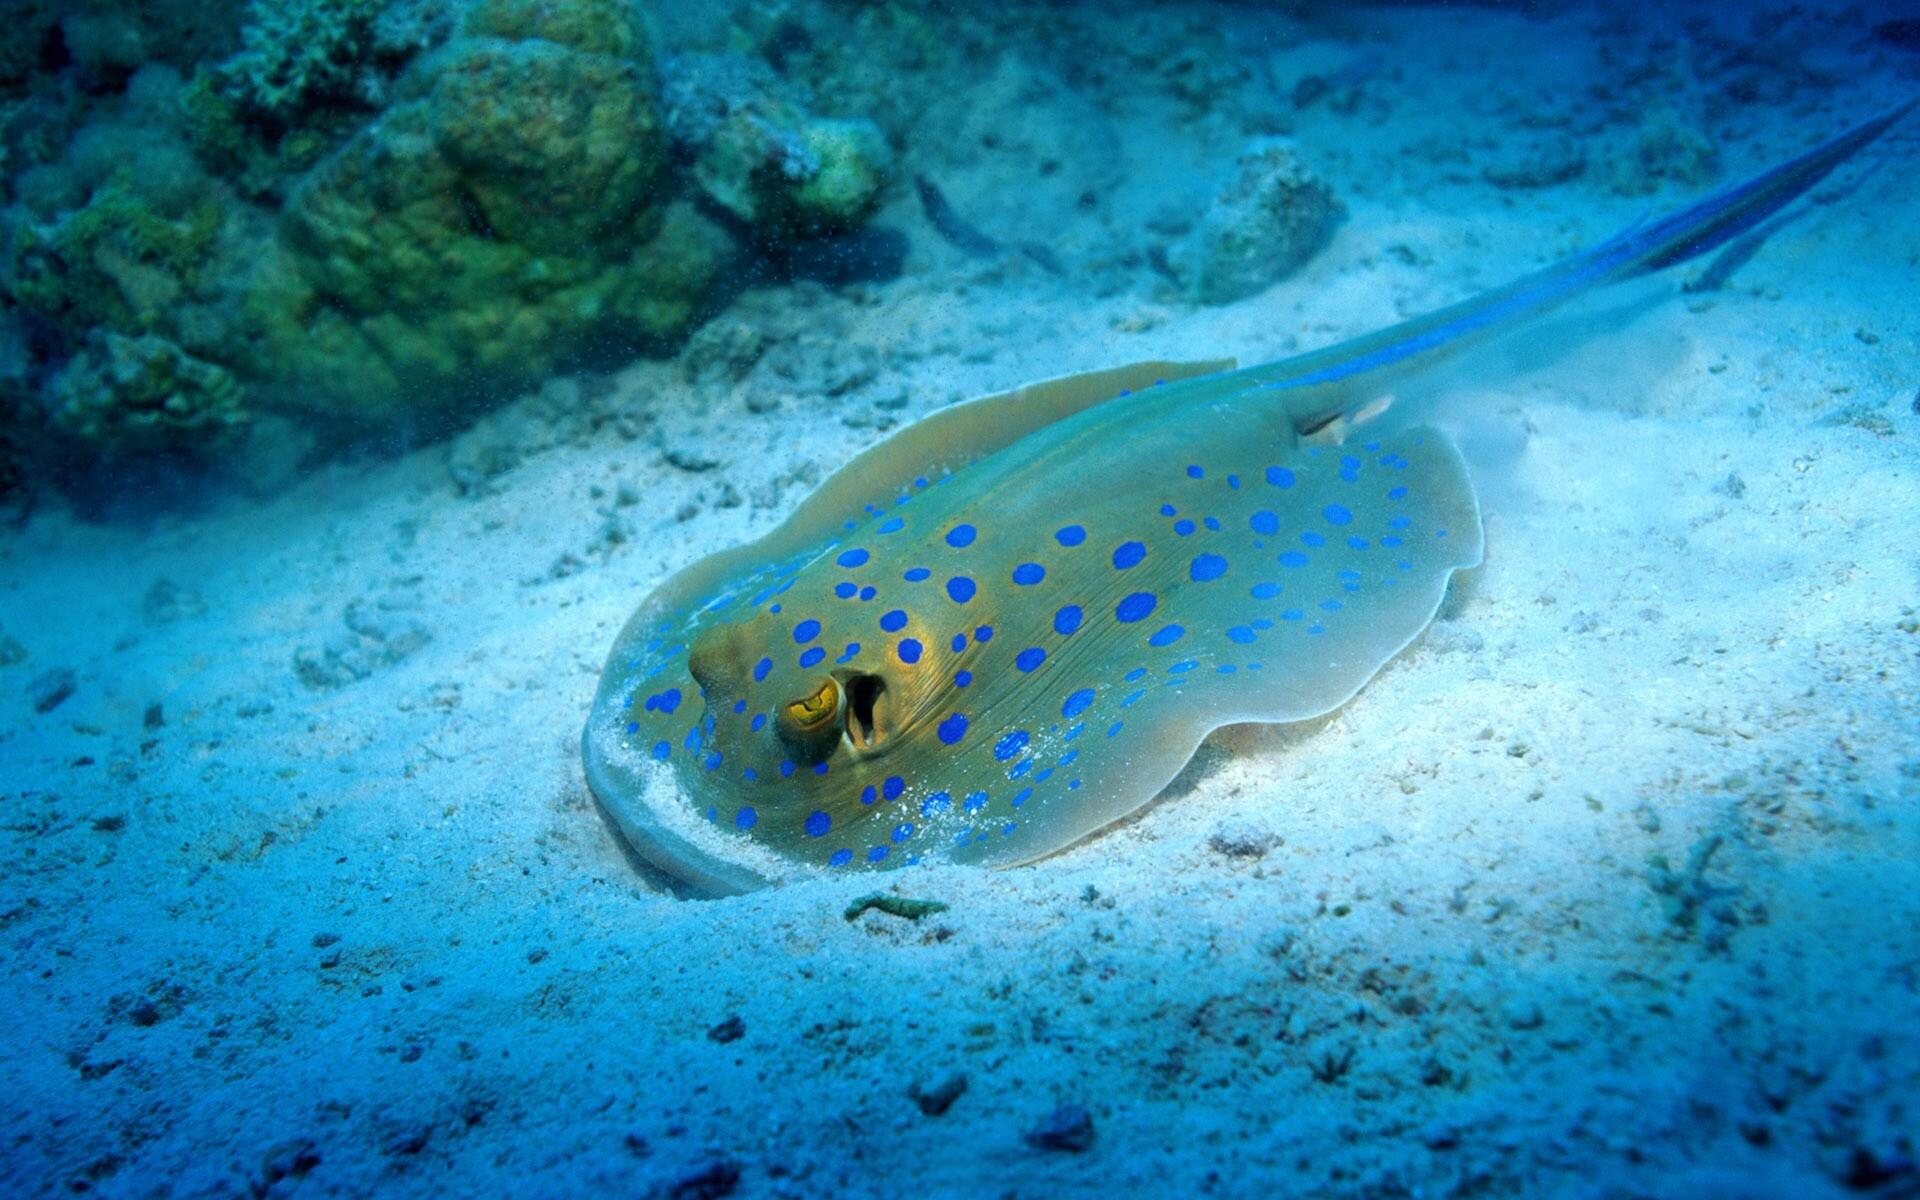 Ocean Life Marine Life Pics   Daily Pics Update   HD Wallpapers .